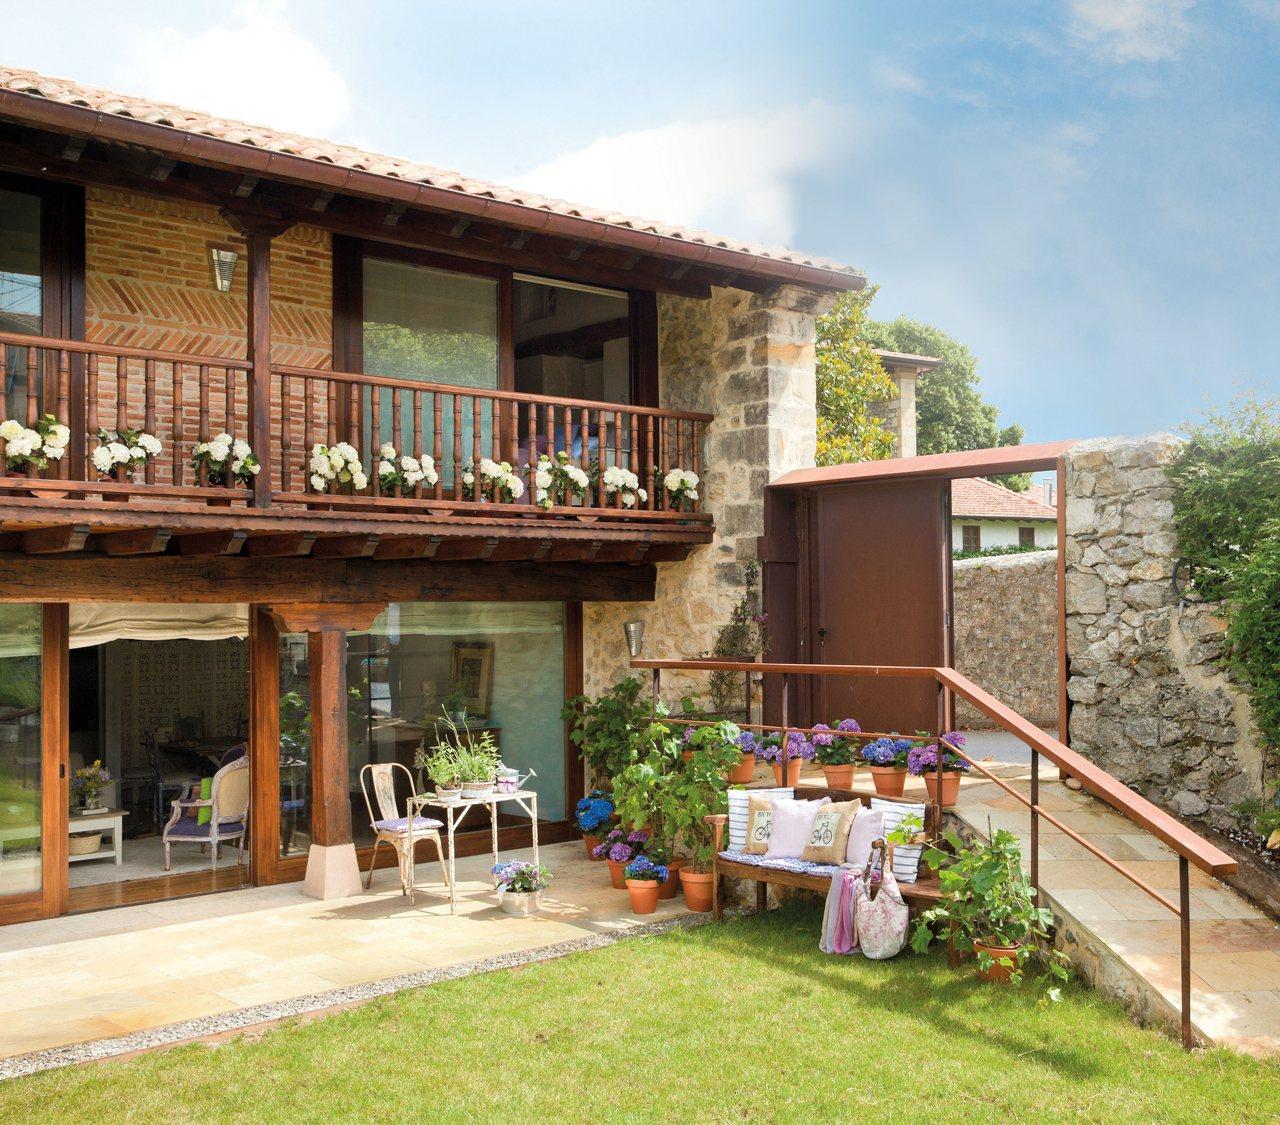 Casa familiar en cantabria con jard n for Exterior de casas